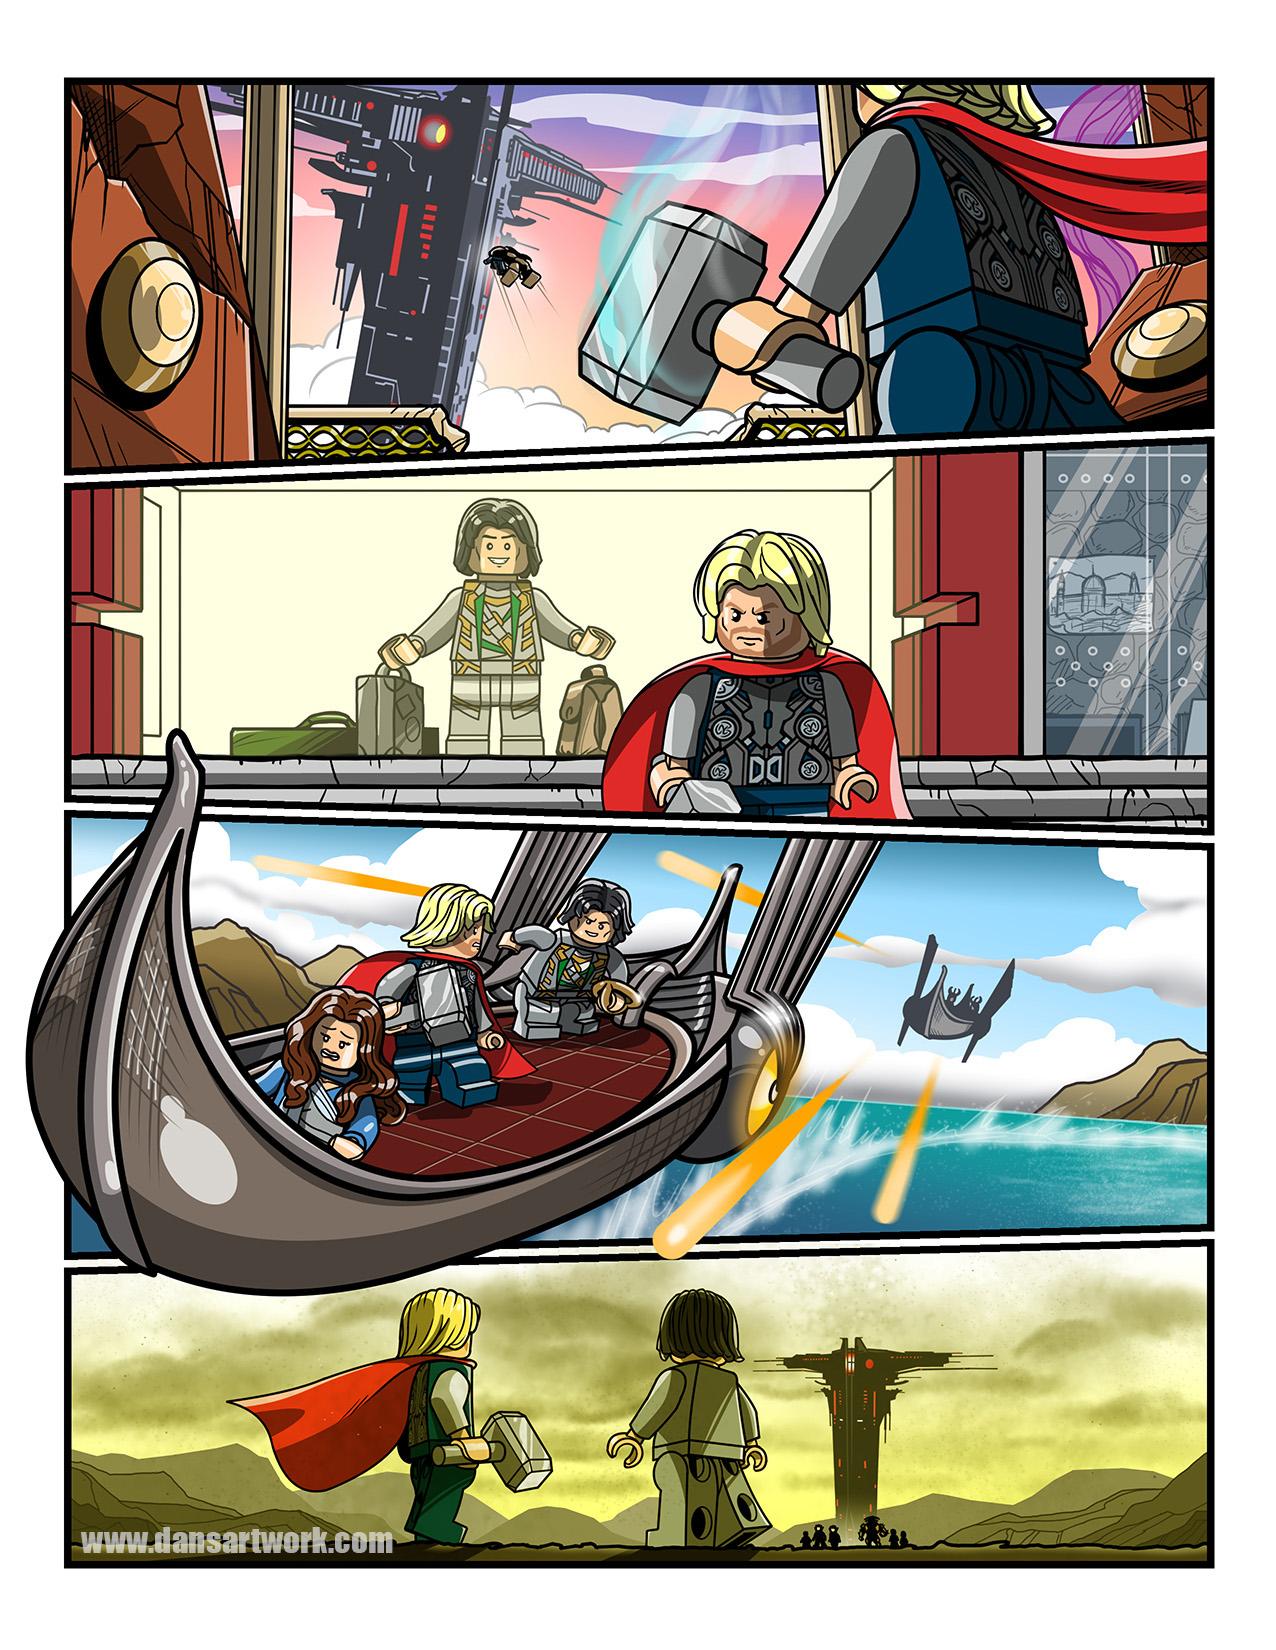 Thor2_Midtro1_Pg1_FinalColors_@dveese.jpg